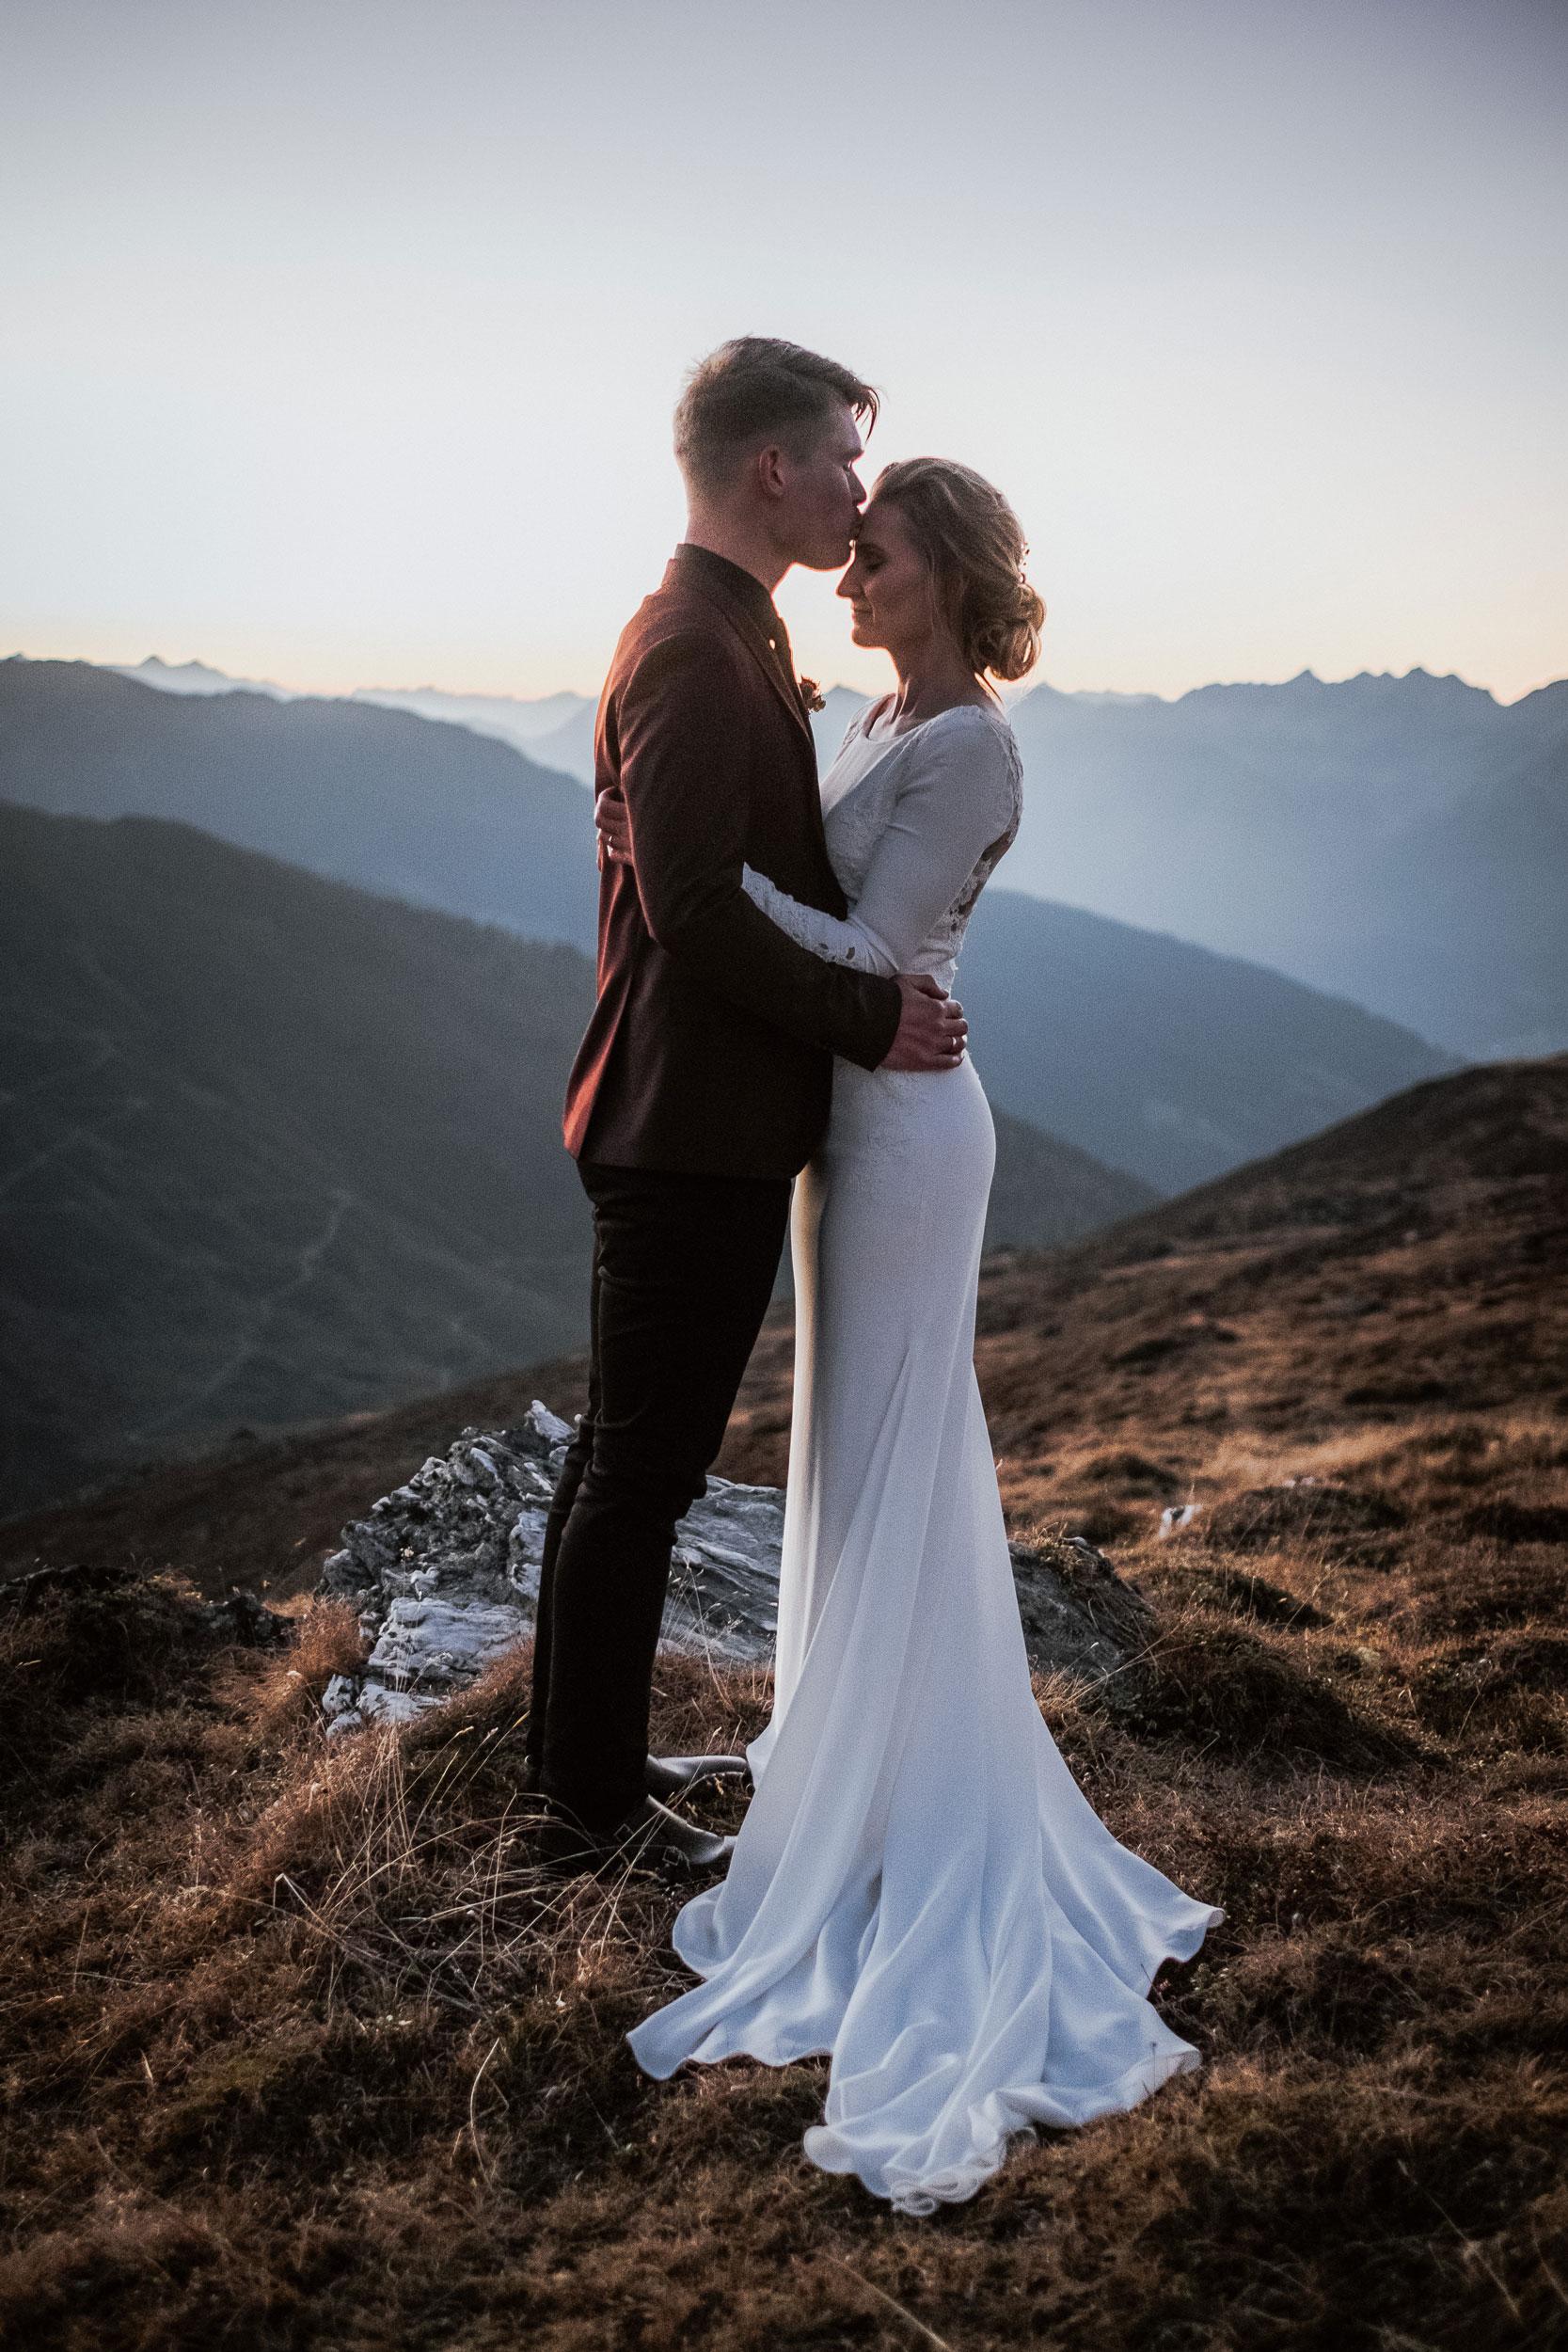 bridalhairandmakeup makeup artist mountain wedding tyrol austria destination Wedding